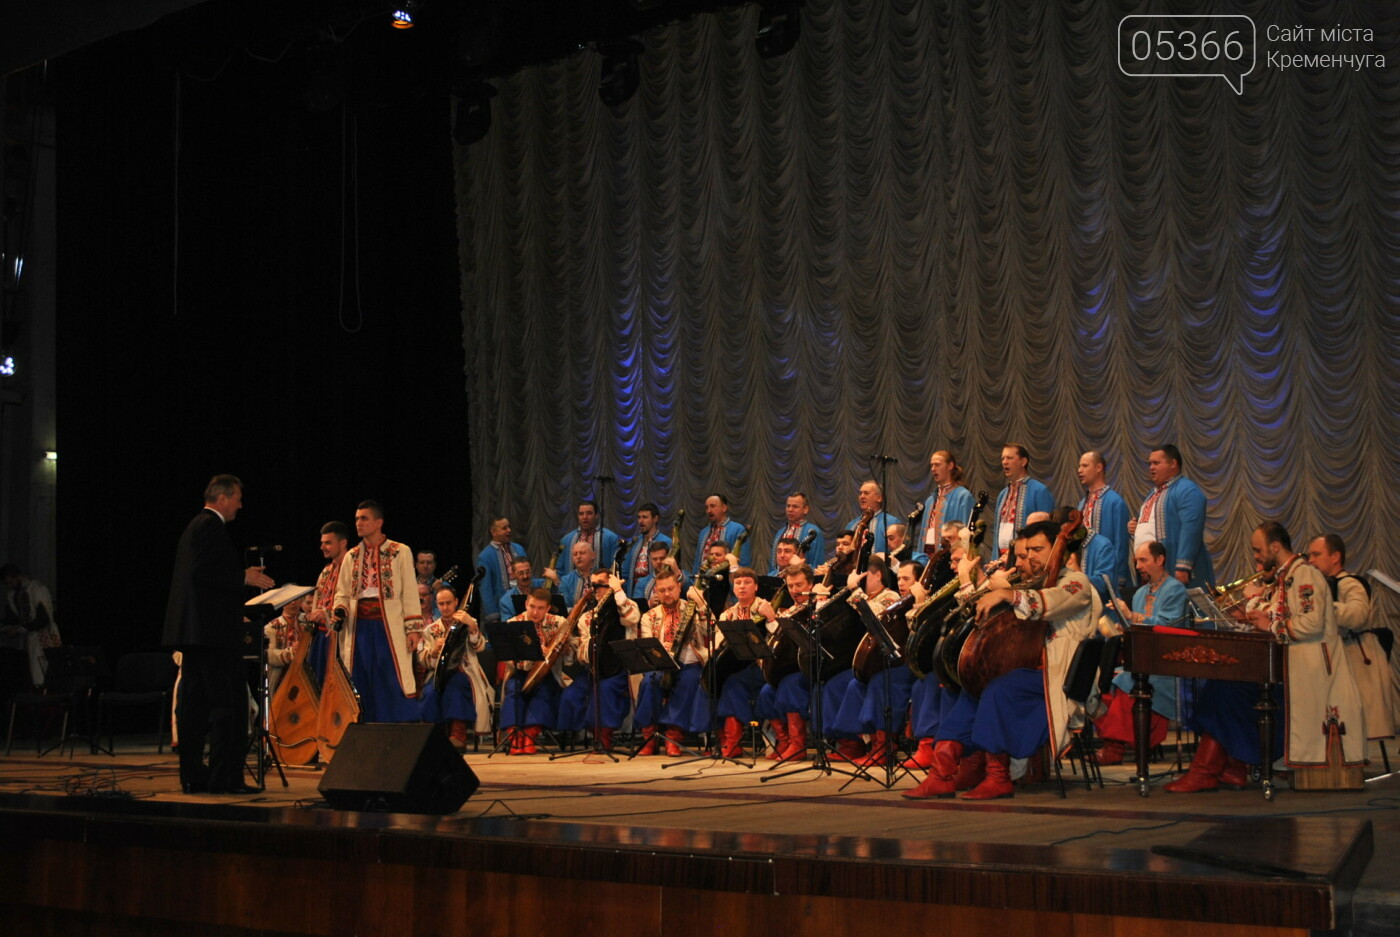 Бандуристи покорили кременчужан своїми виступами та музикою. Фото, фото-3